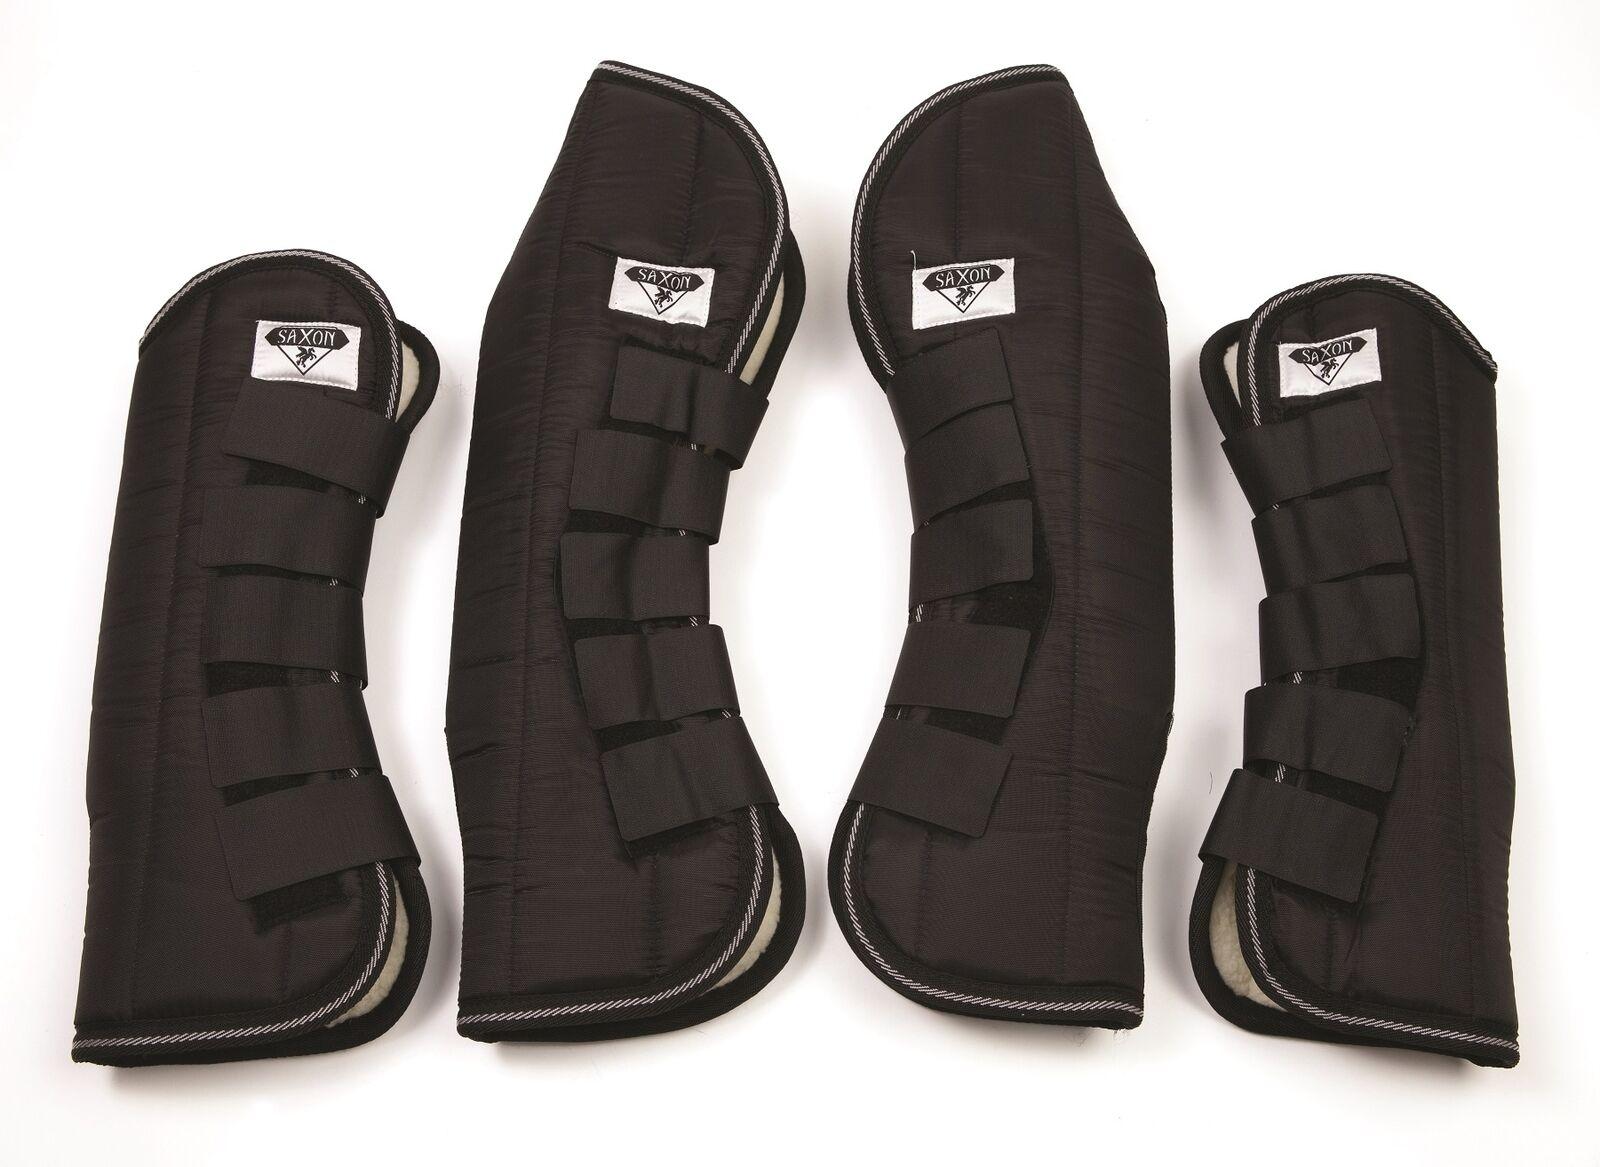 Saxon Travel Boots Set Of 4